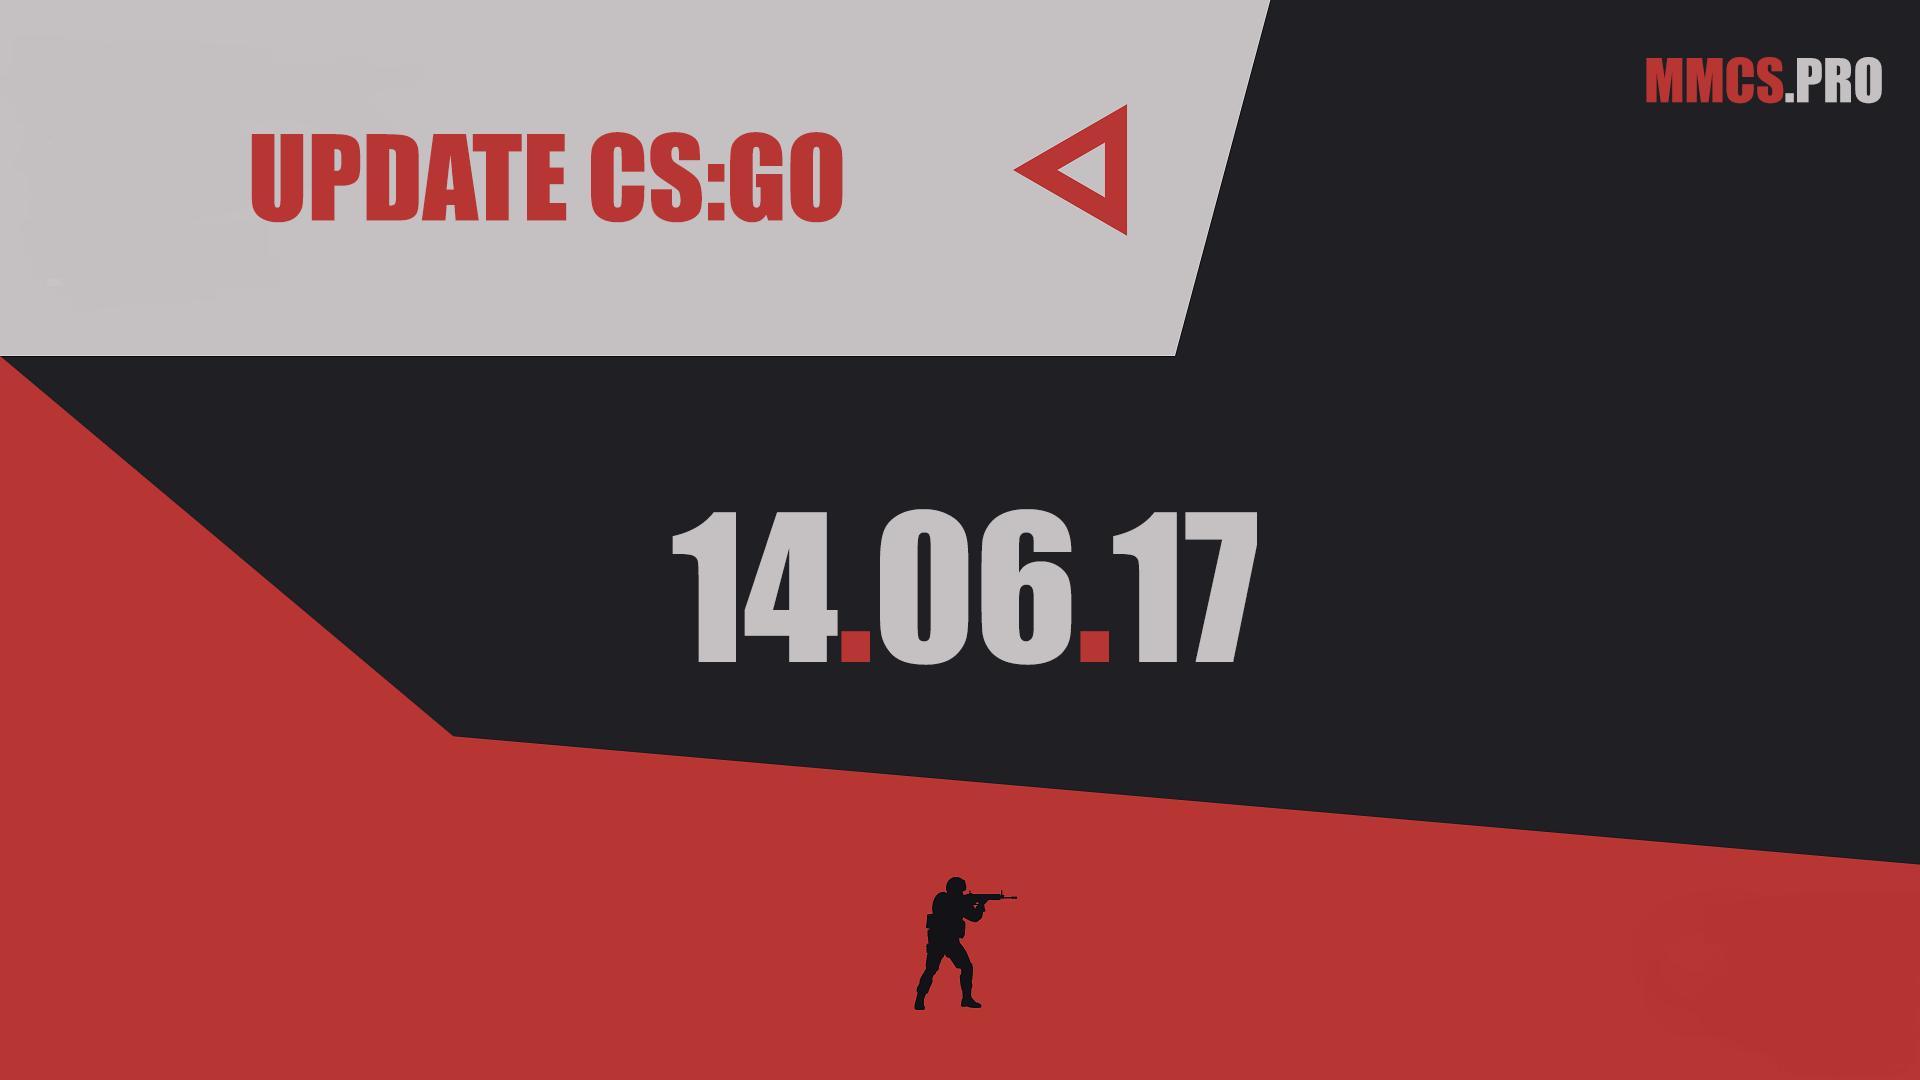 https://mmcs.pro/update-csgo-14-06-2017-valve/